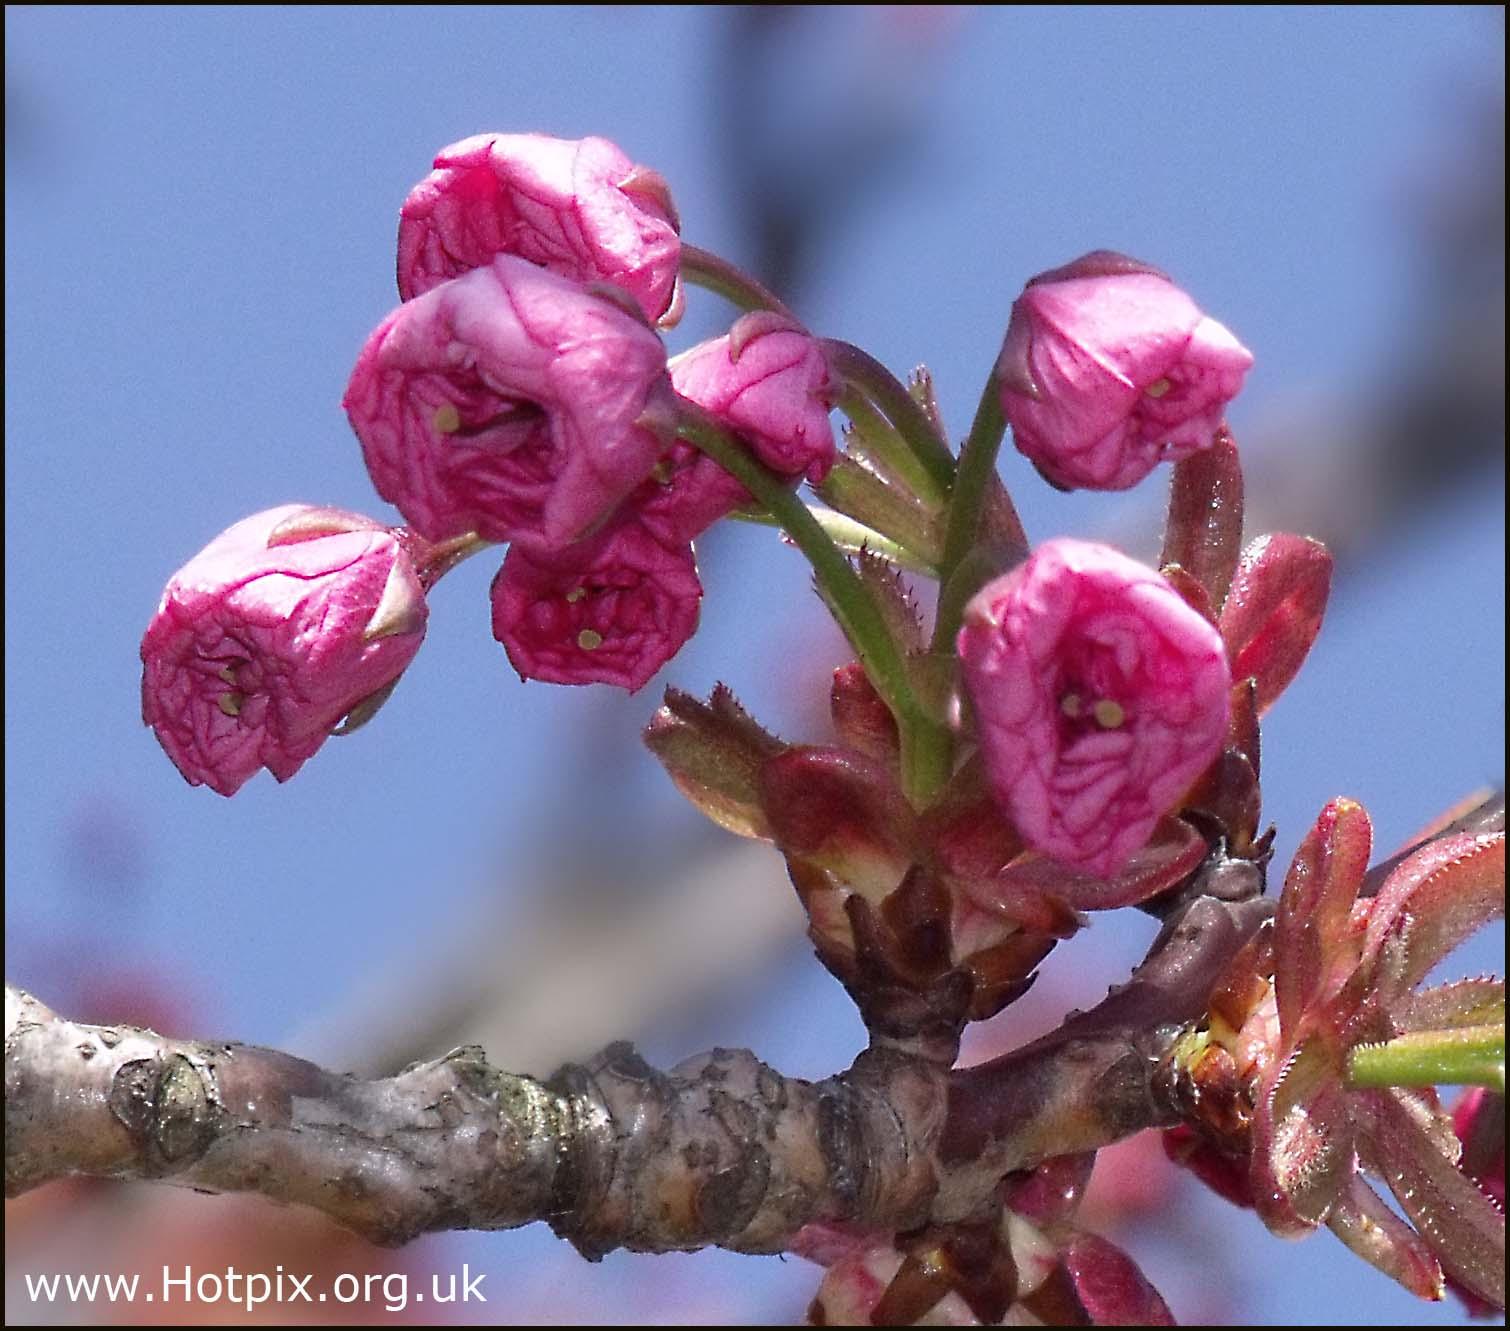 cherry,blossom,sakura,tree,knutsford,rd,road,grappenhall,cheshire,england,UK,purple,pink,red,nature,flowers,hotpixuk,hotpix,tonysmith,tony,smith